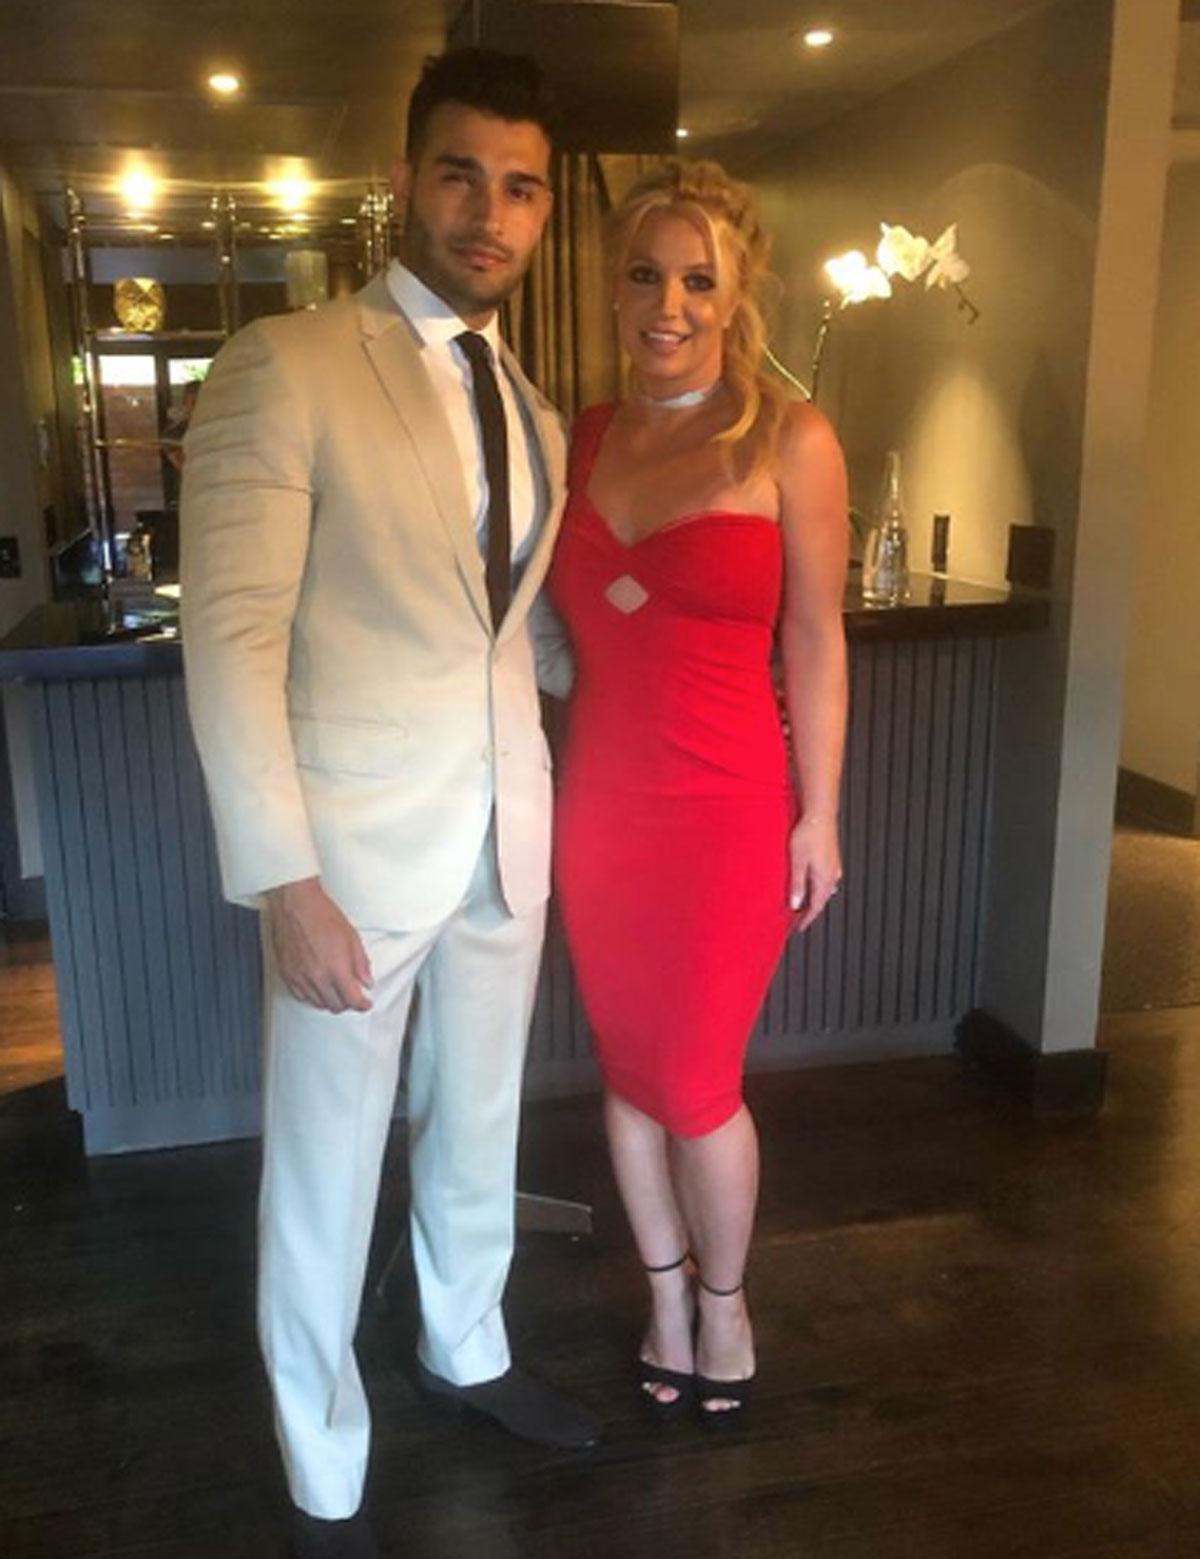 Britney Spears and Sam Asghari posing for Instagram